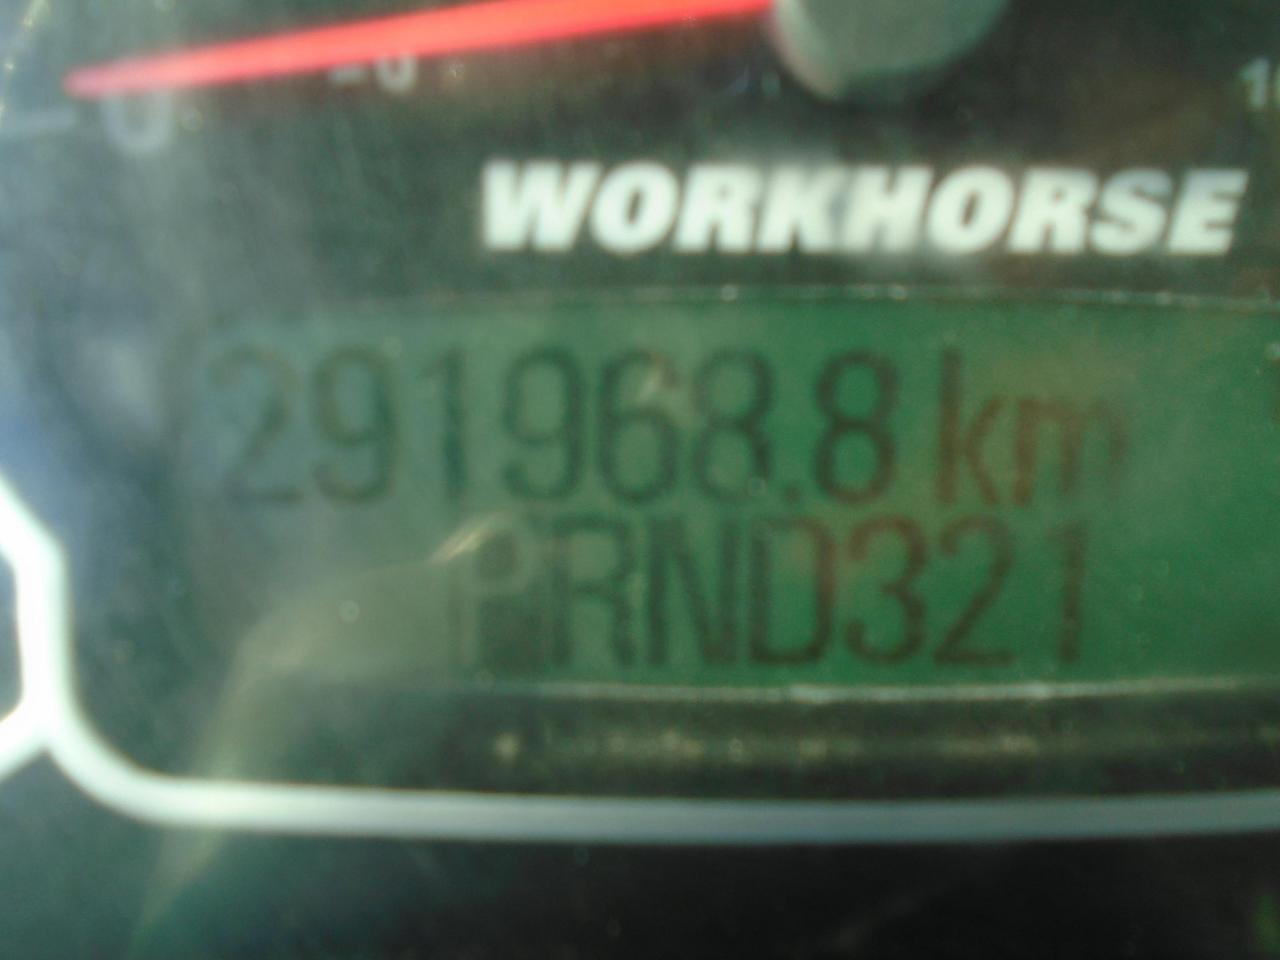 2007 Chevrolet Workhorse